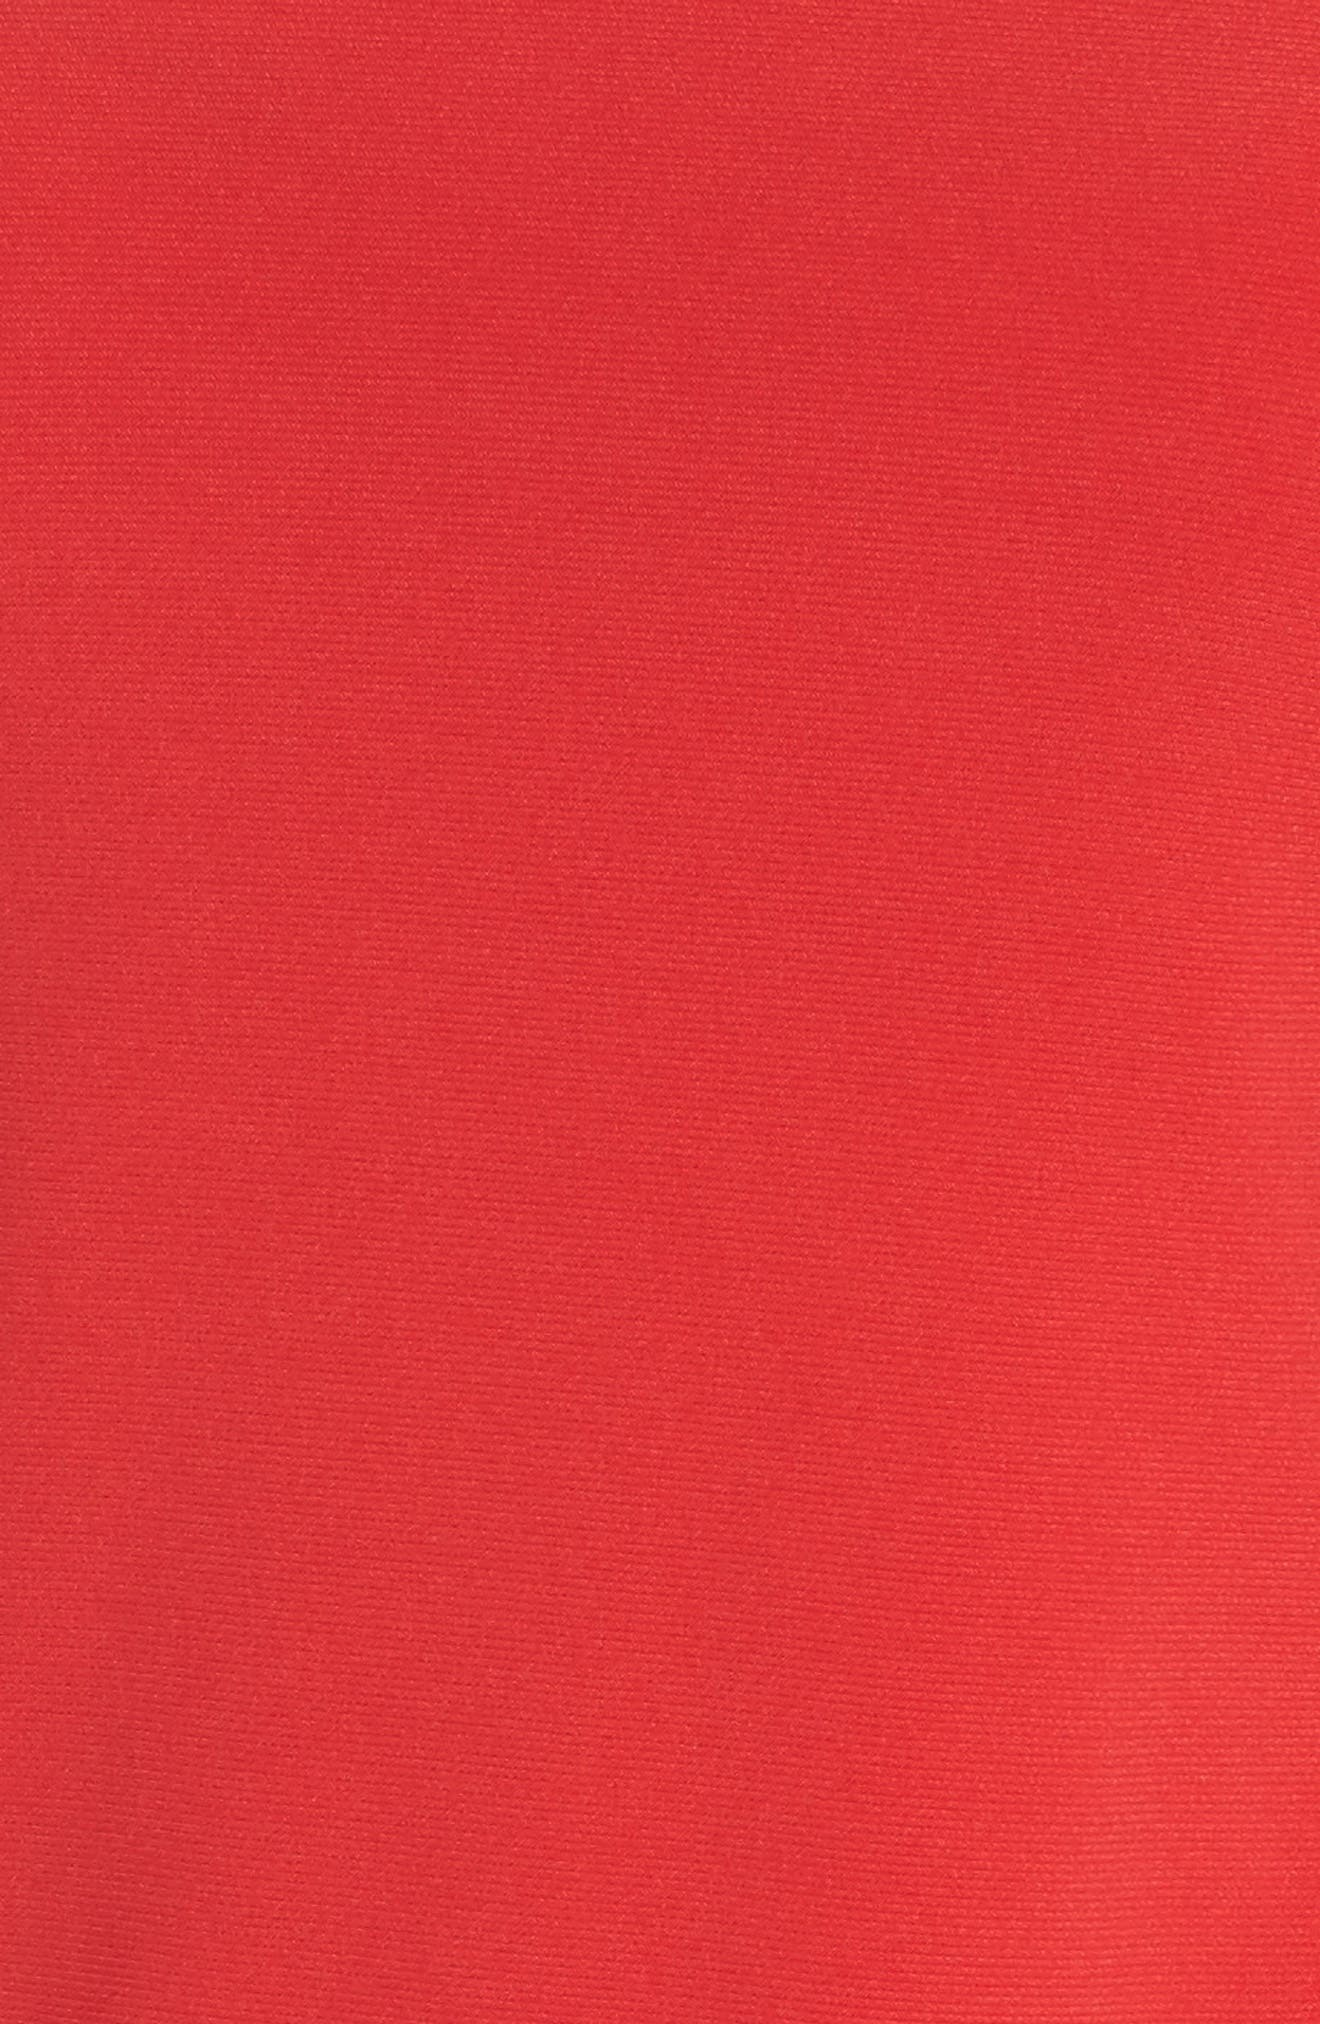 Musa One-Shoulder Dress,                             Alternate thumbnail 5, color,